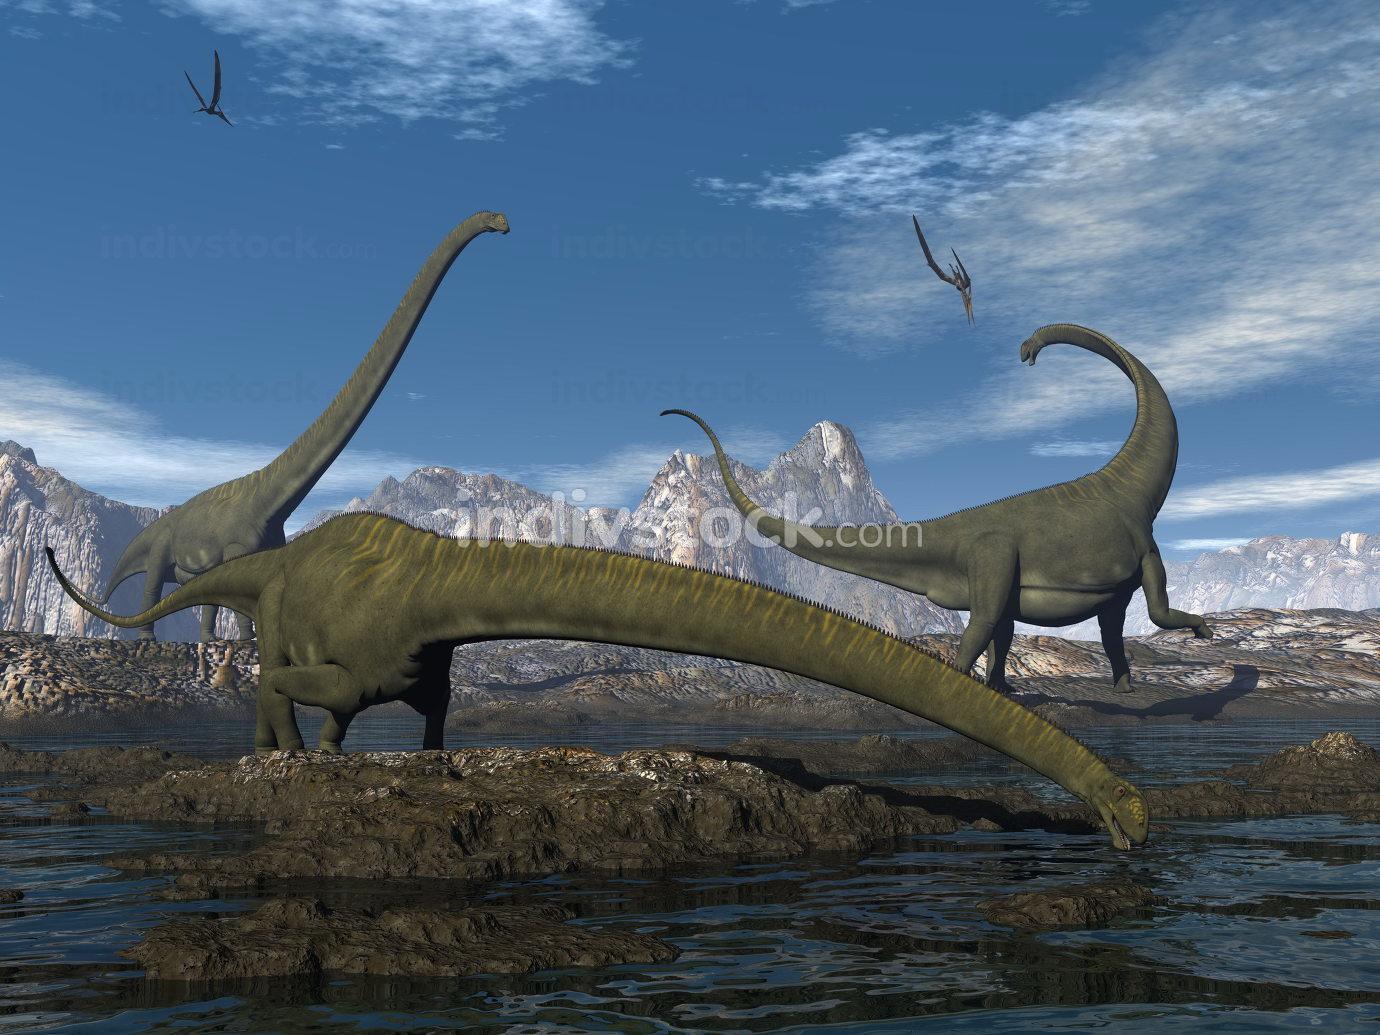 Mamenchisaurus dinosaurs walk and drink - 3D render